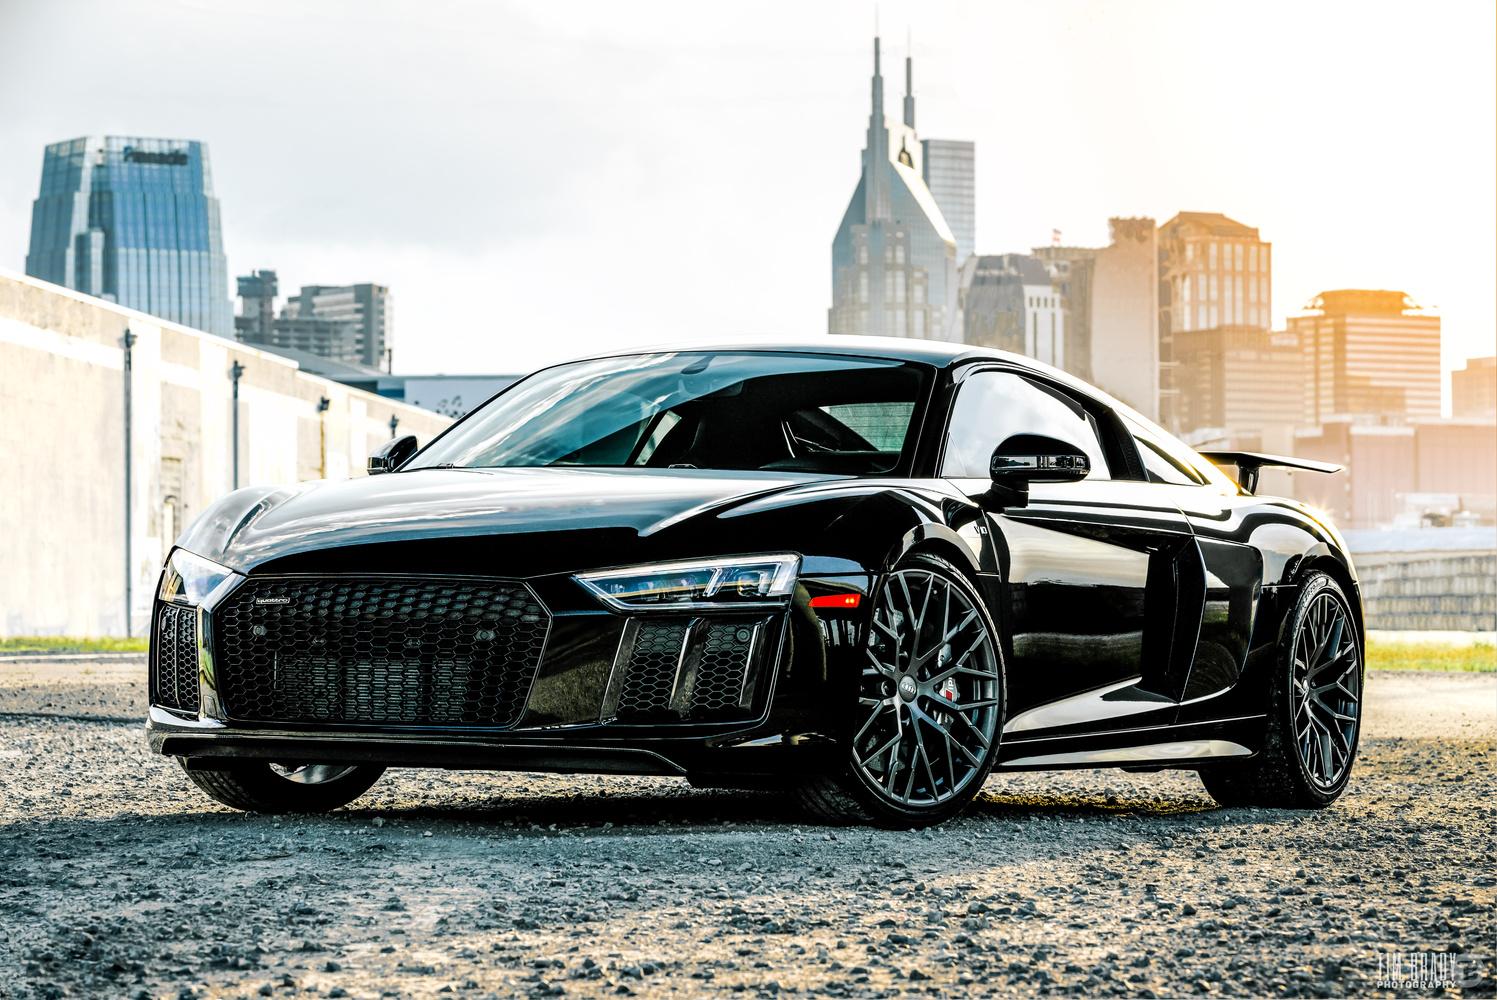 2017 Audi R8 V10+ by Tim Brady